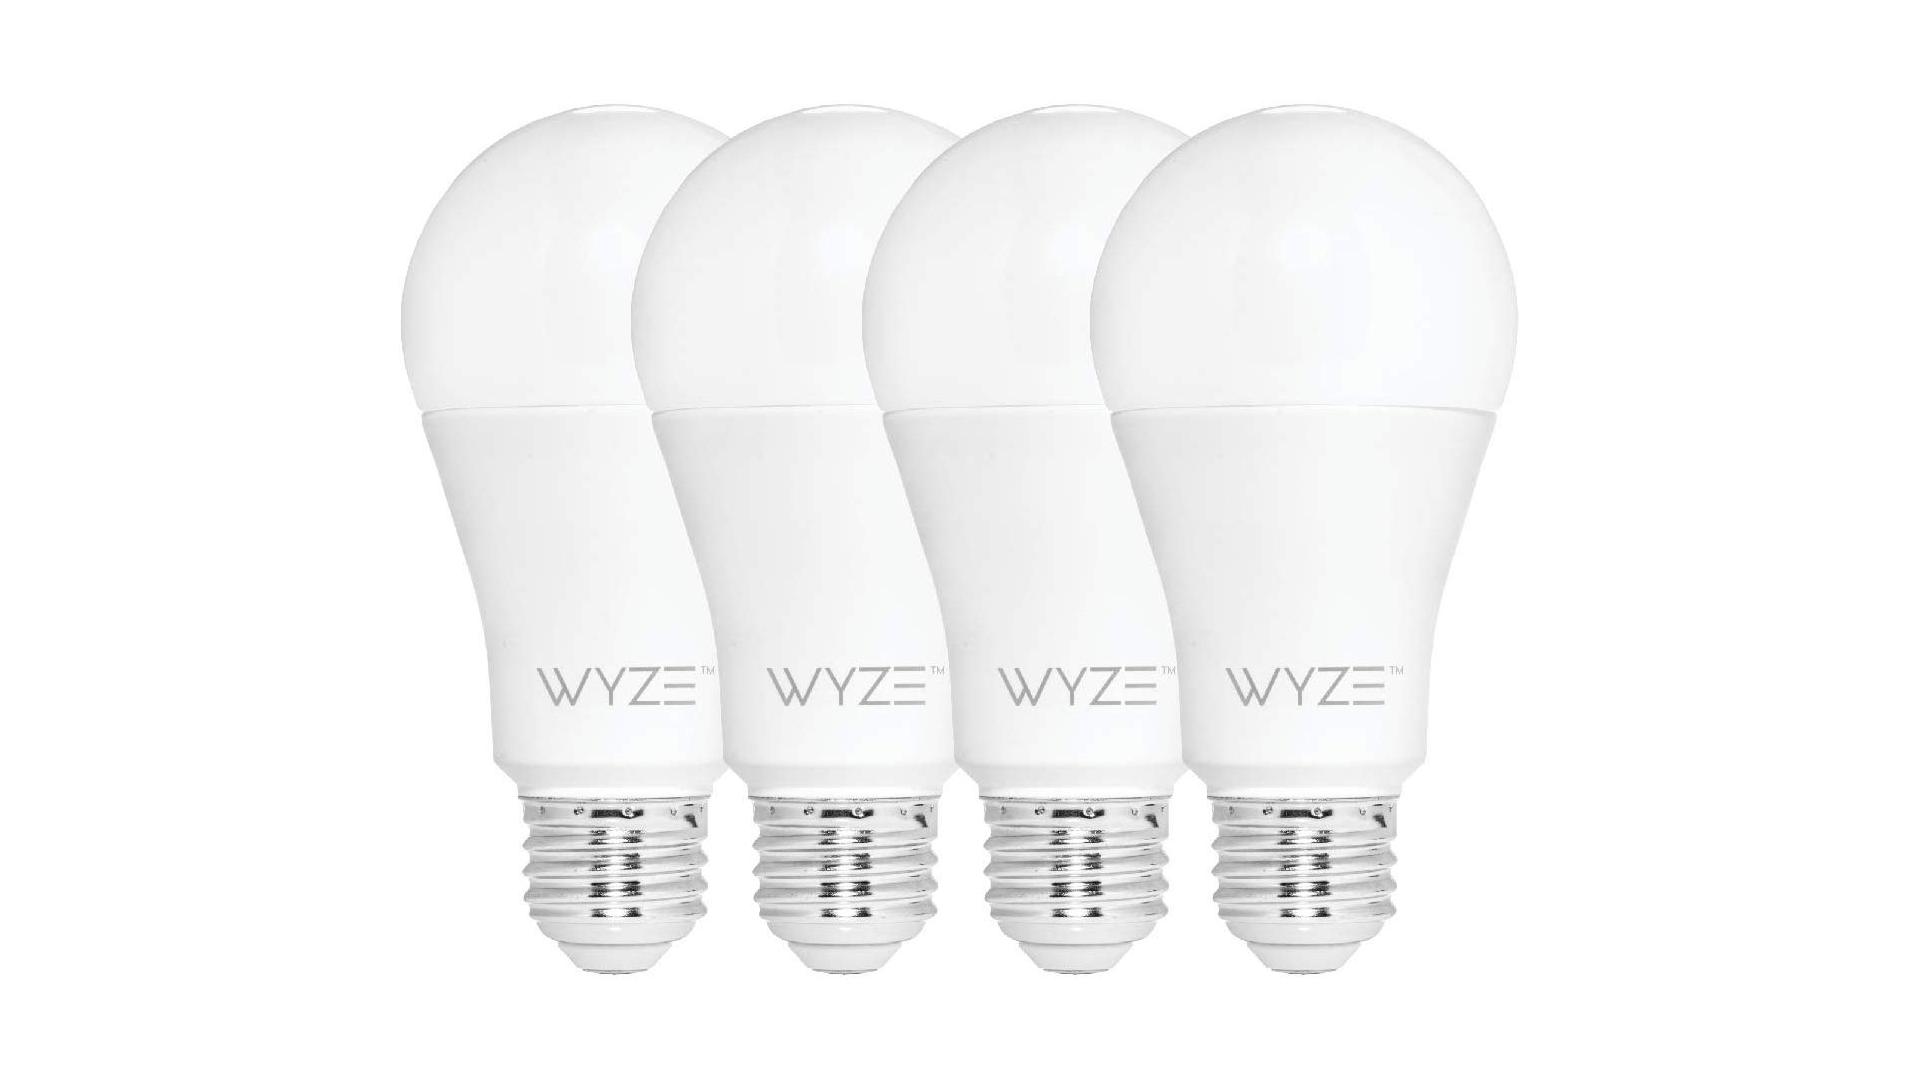 A set of four Wyze smart bulbs.